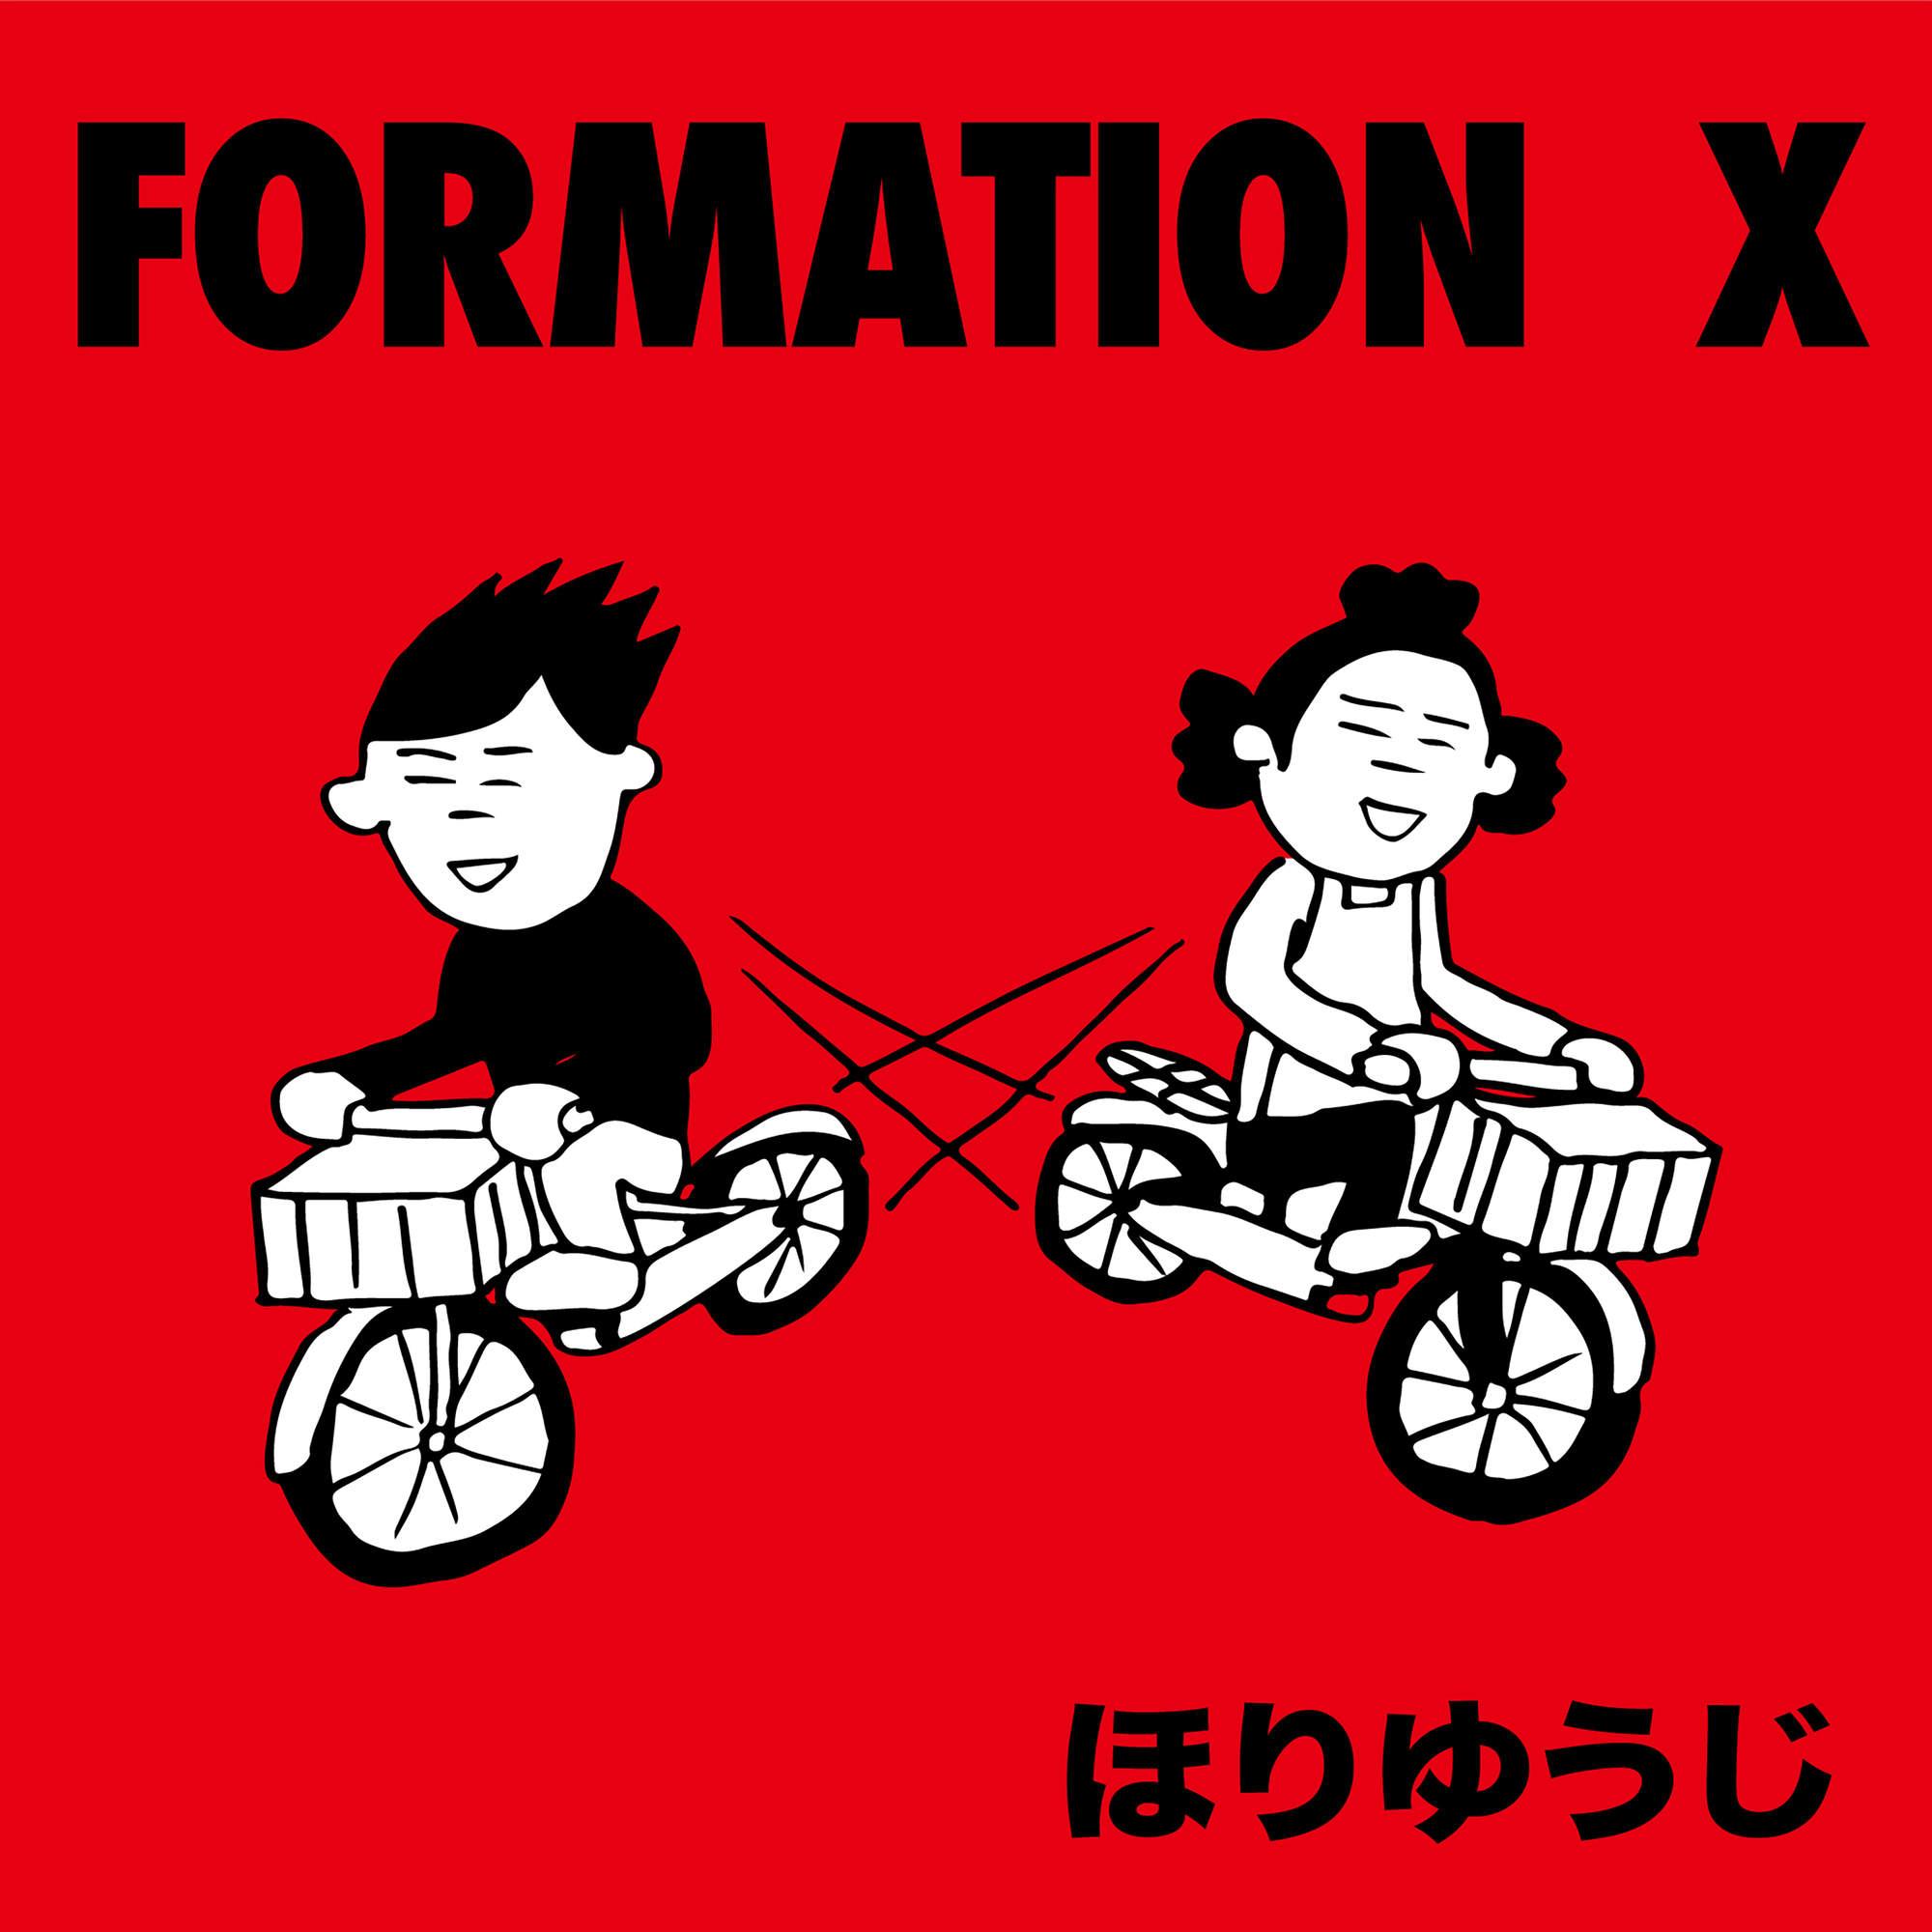 http://rose-records.jp/files/20210812150023.jpg